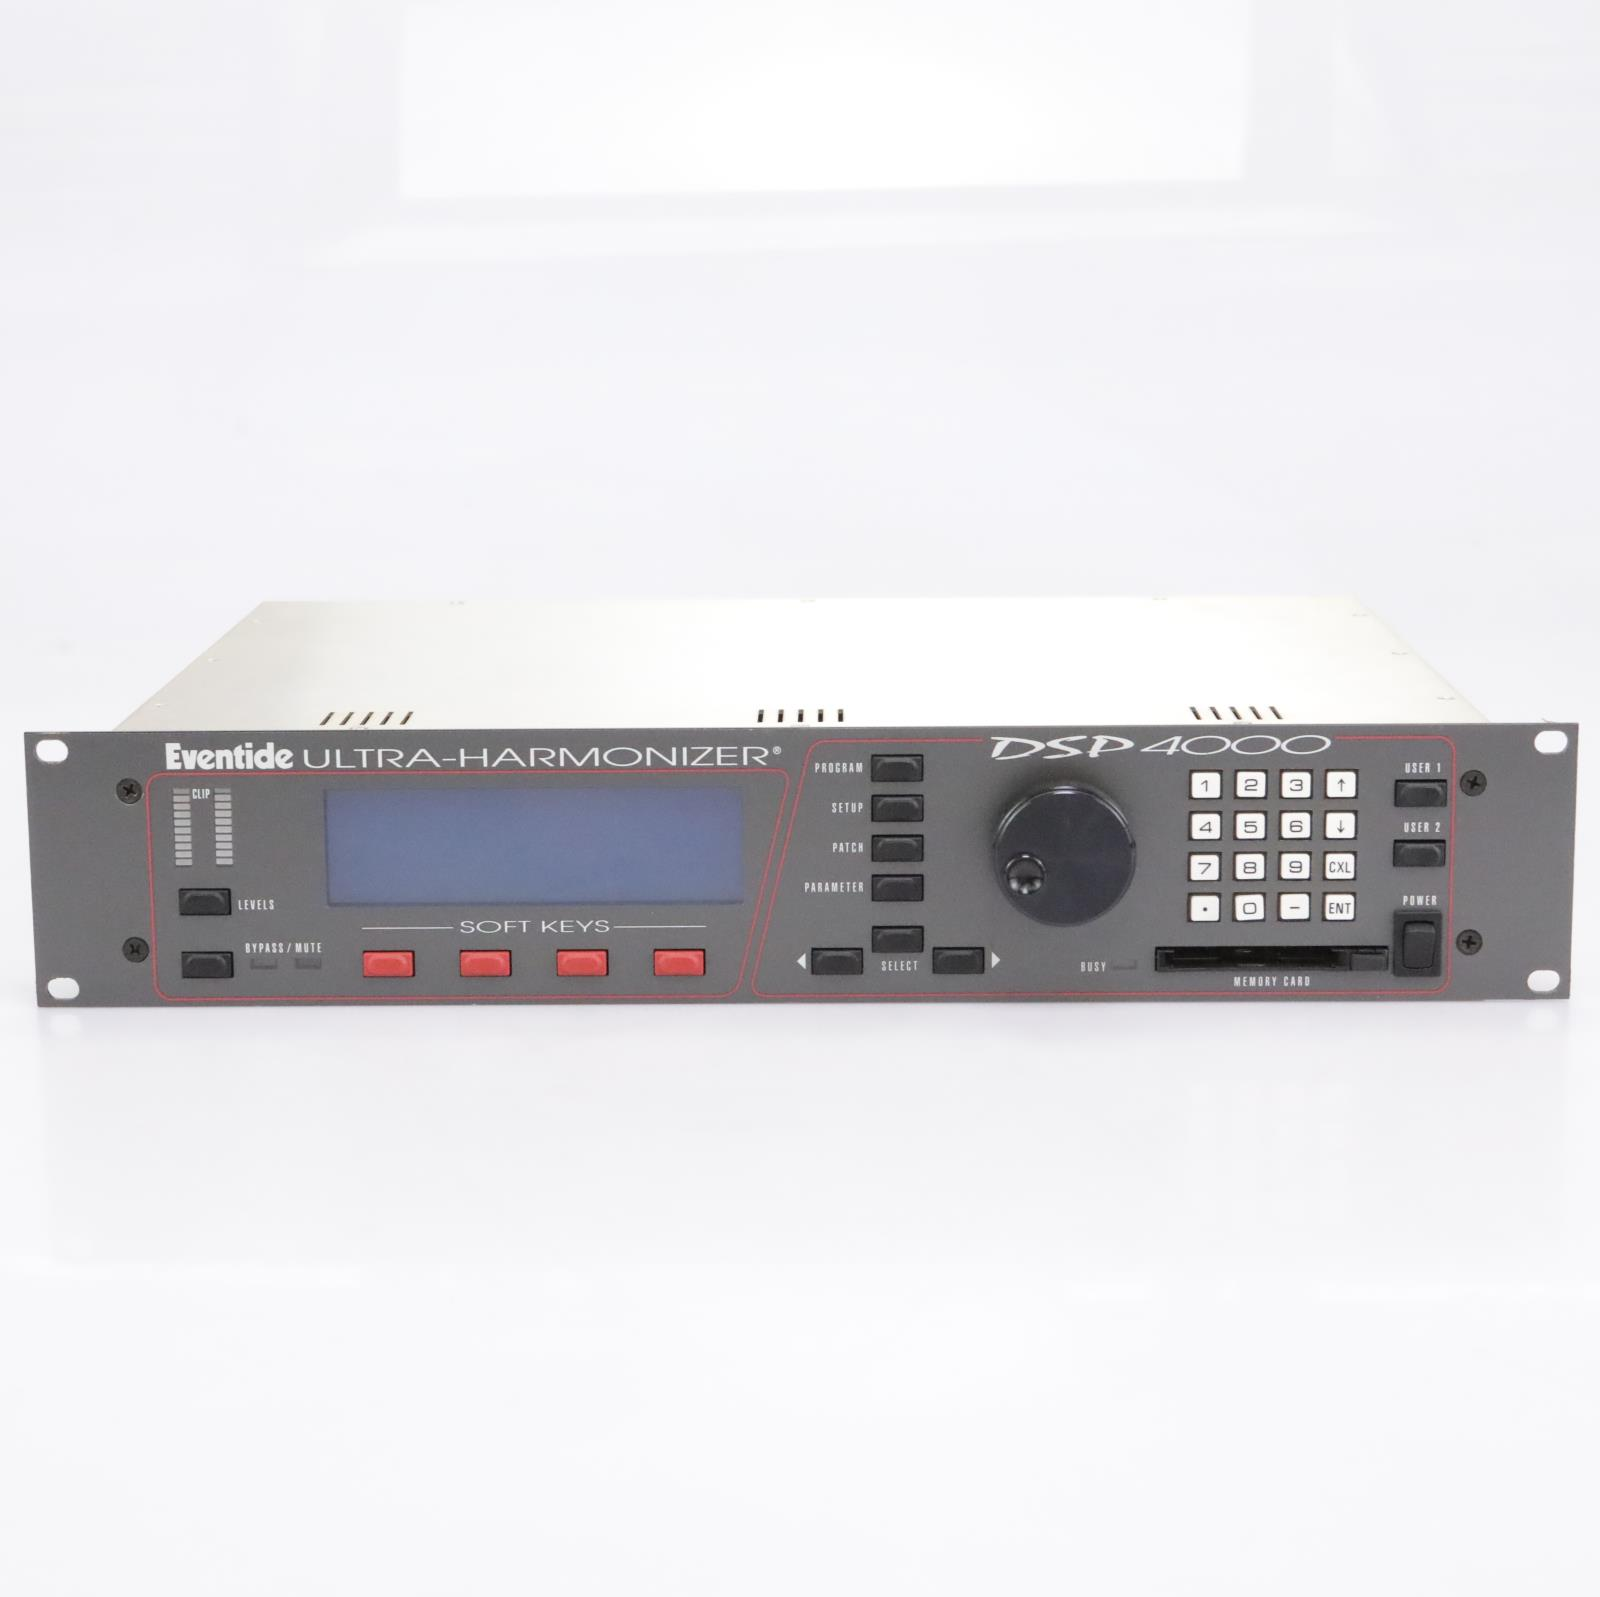 Eventide DSP 4000 Ultra-Harmonizer Effects Processor DSP4000 #43461